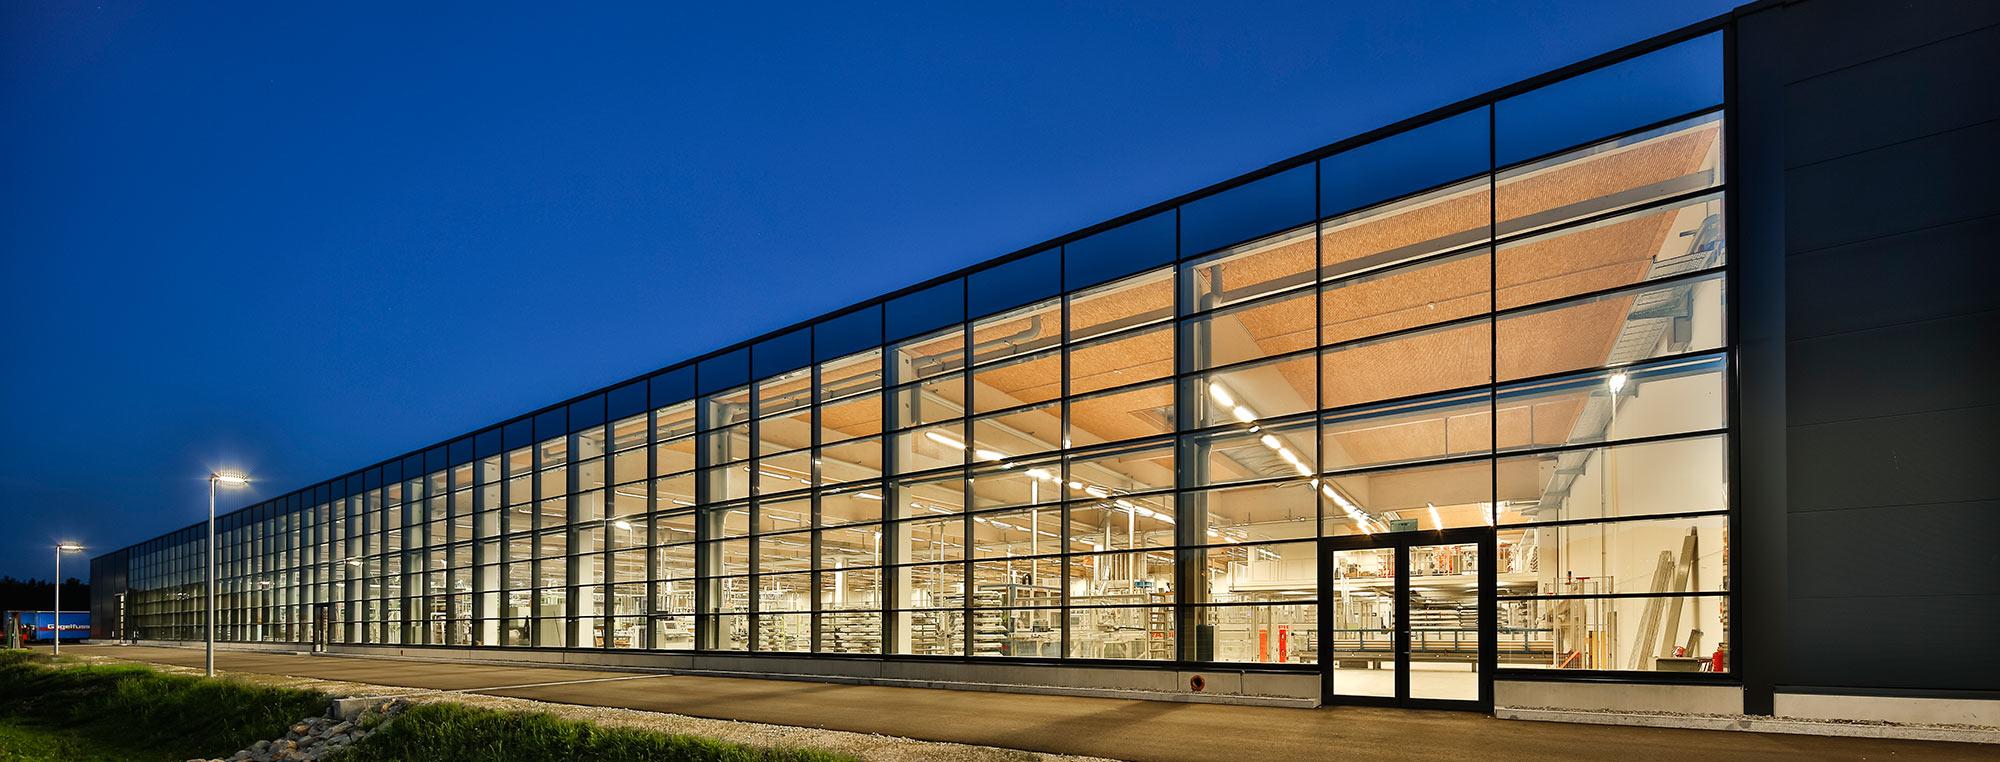 Produktionsalle der Firma Gugelfuss in Elchingen